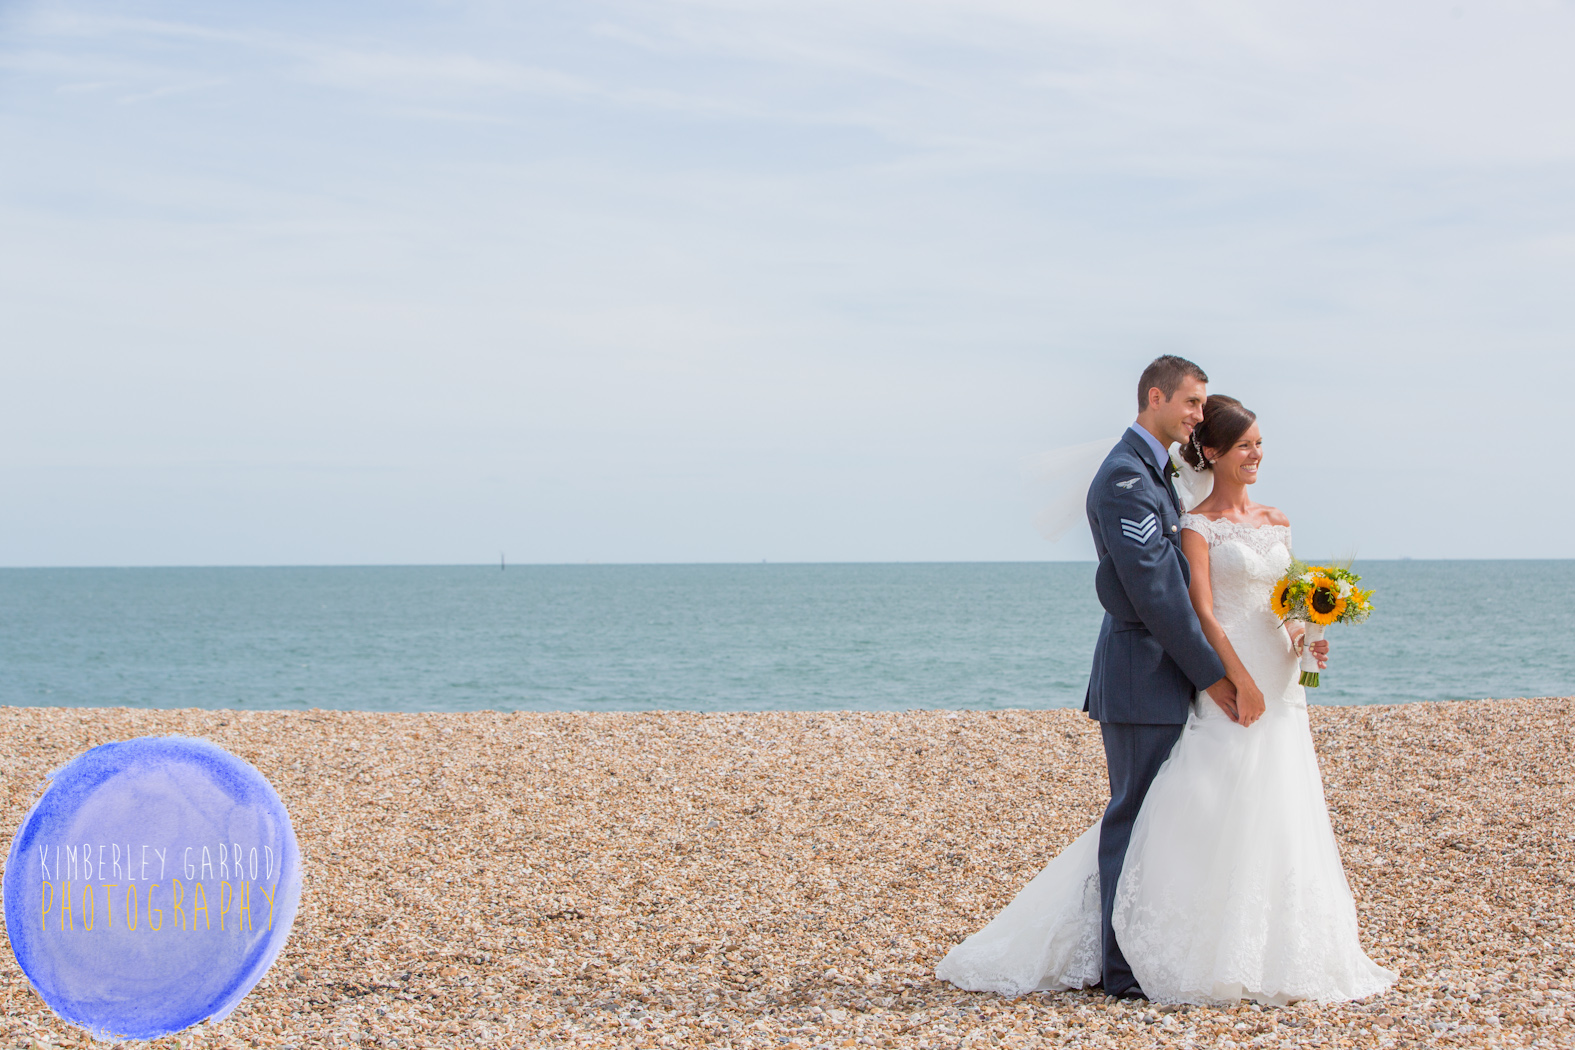 Royal Marines Museum Southsea Wedding Photographer Kimberley Garrod-17